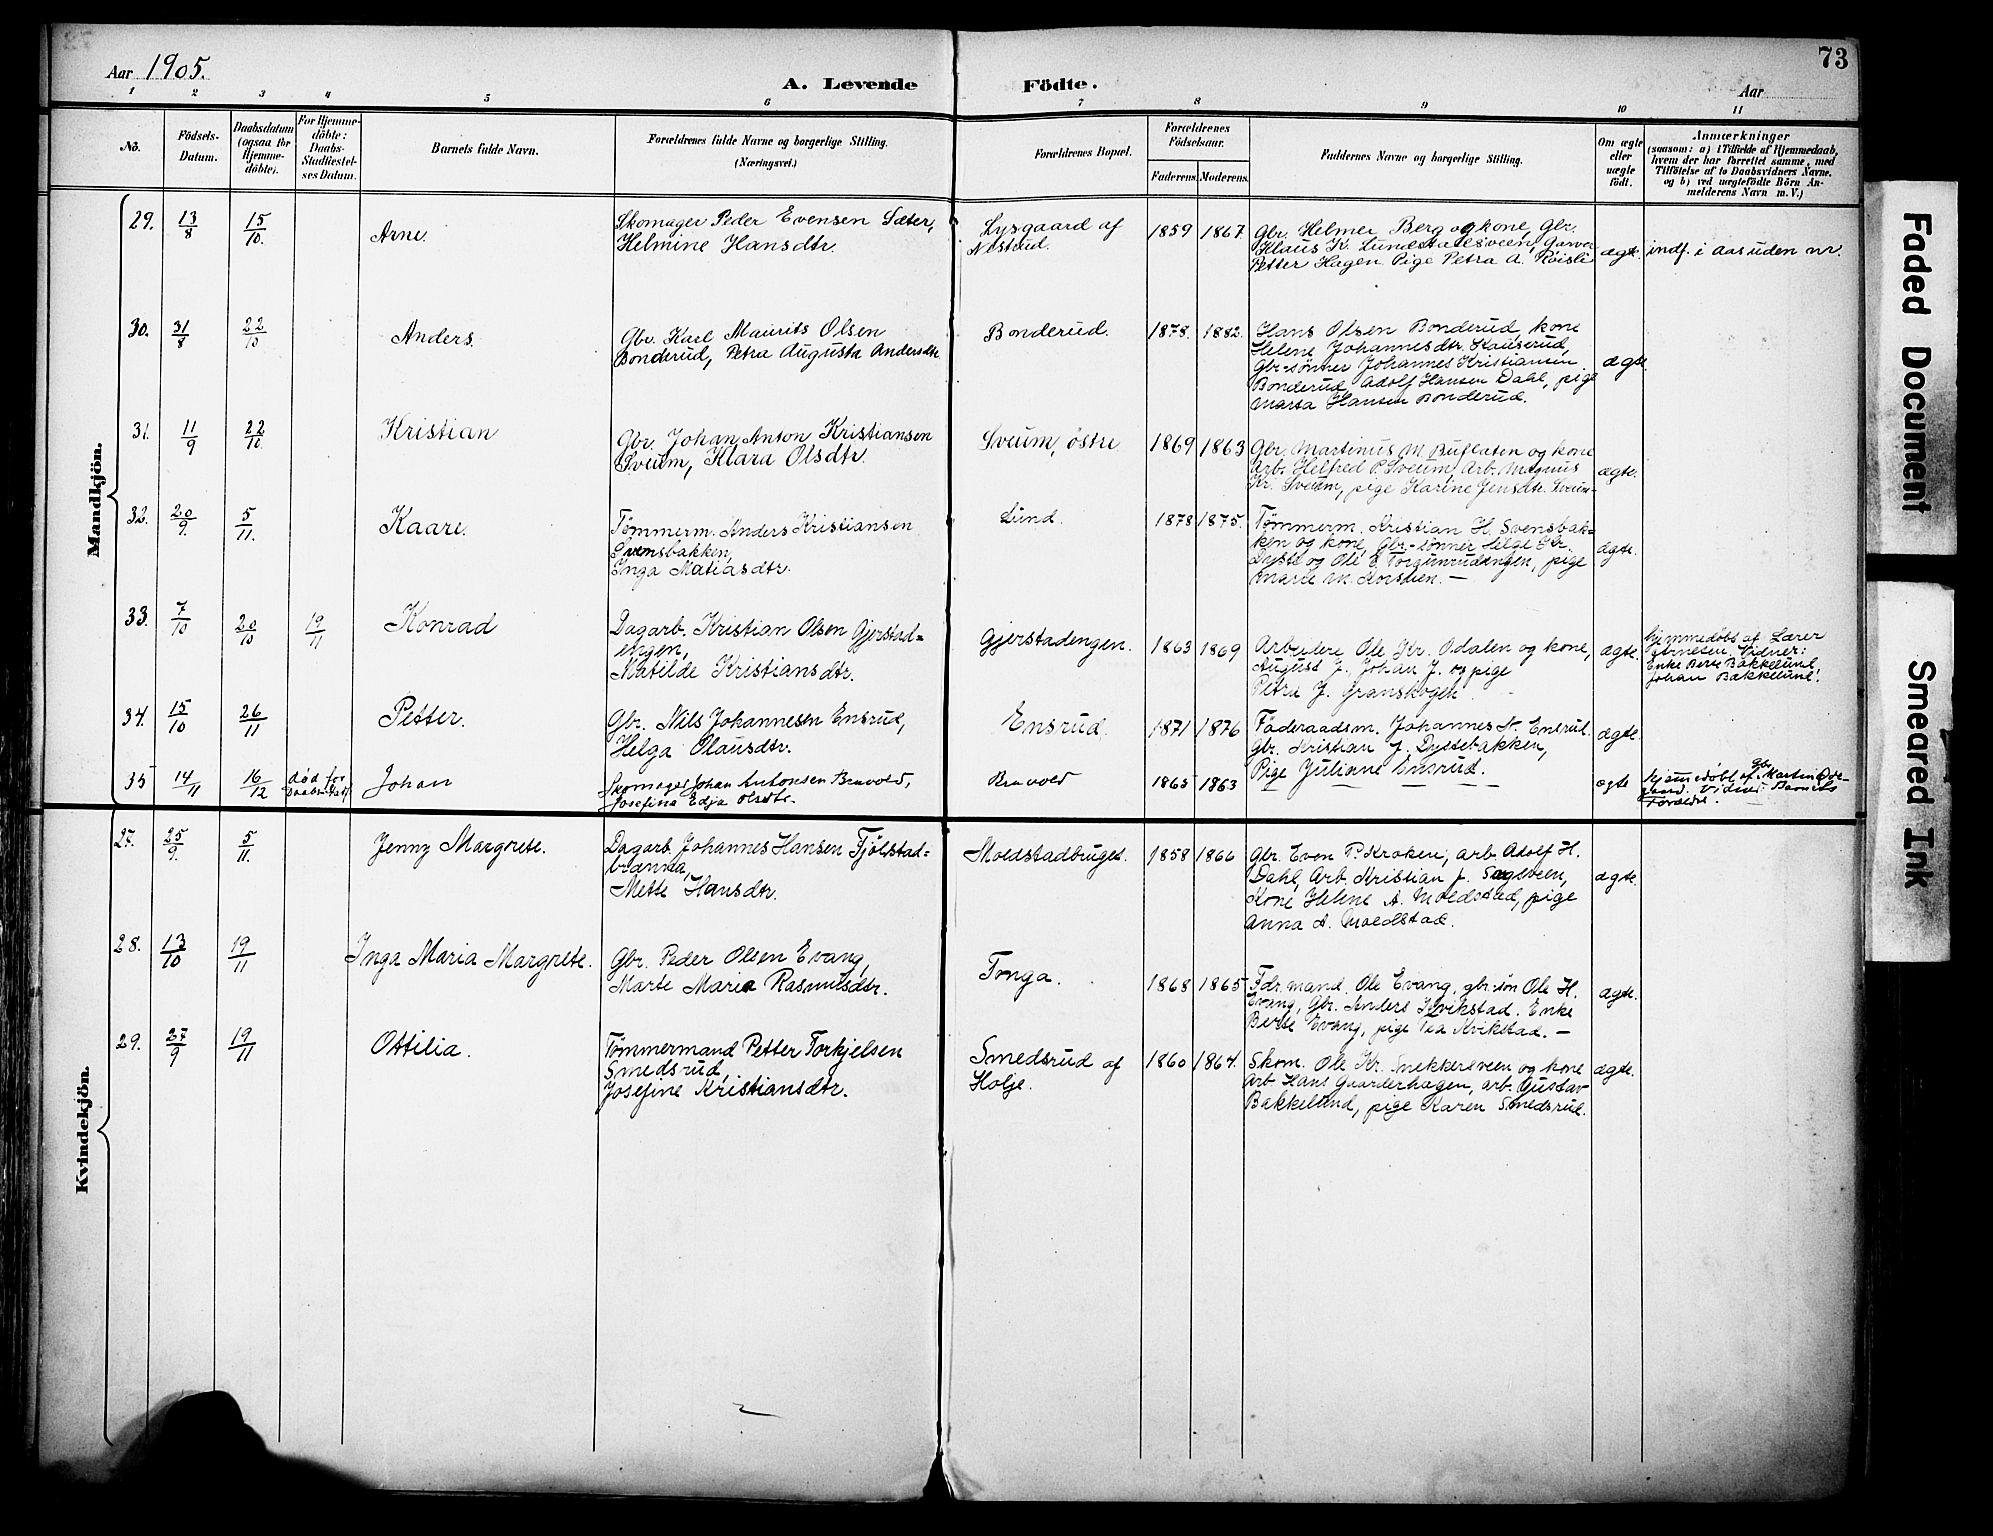 SAH, Vestre Toten prestekontor, H/Ha/Haa/L0013: Ministerialbok nr. 13, 1895-1911, s. 73